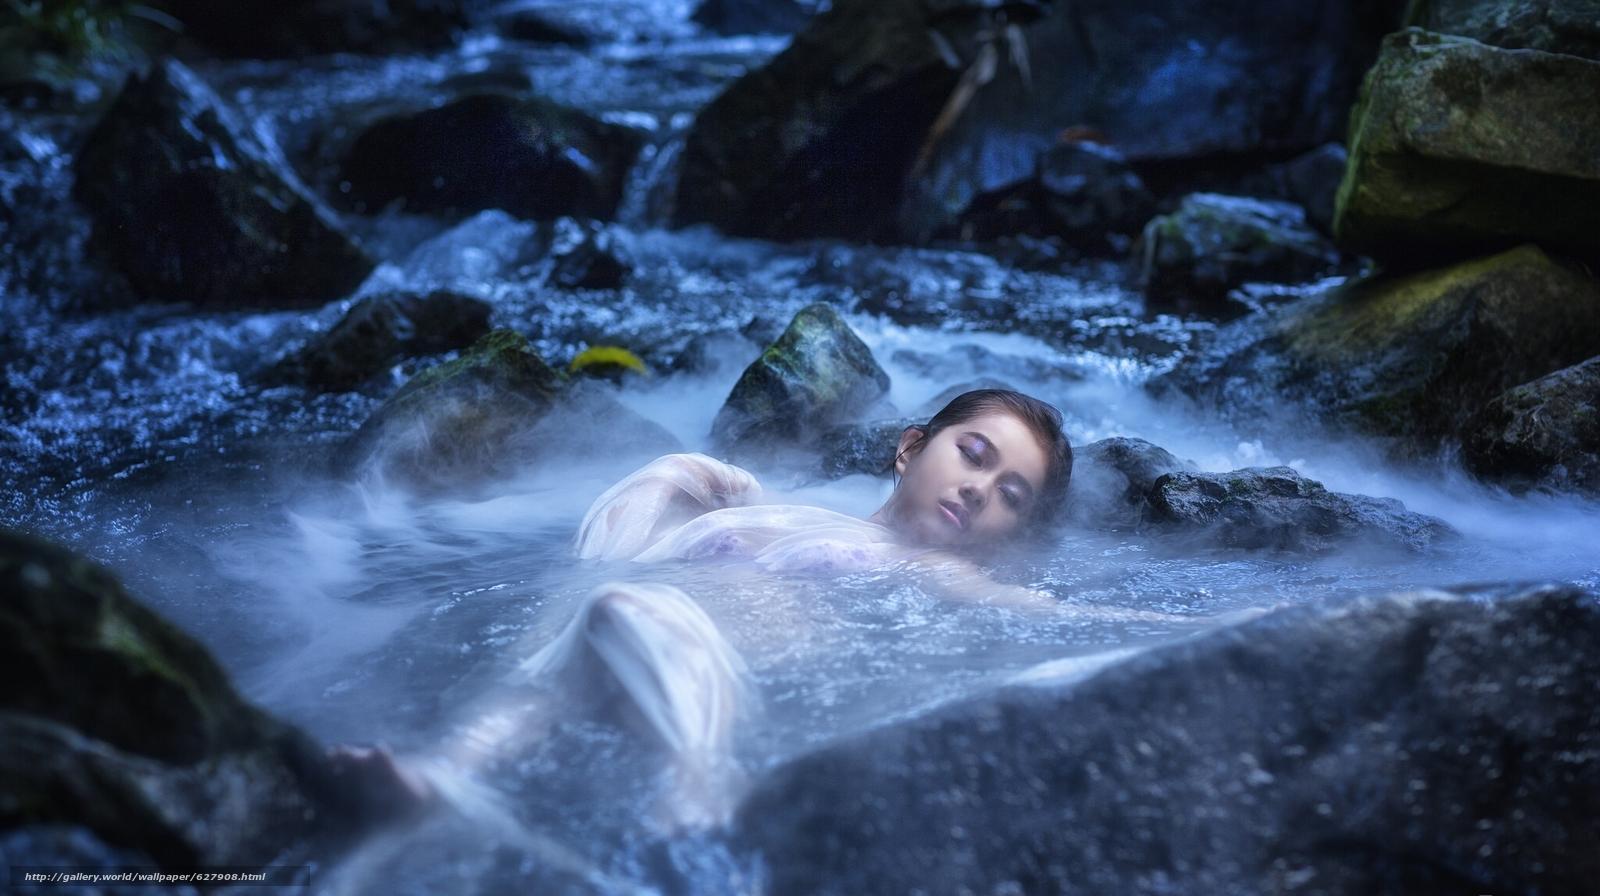 Скачать на телефон обои фото картинку на тему азиатка, вода, река, камни, настроение, разширение 2048x1147